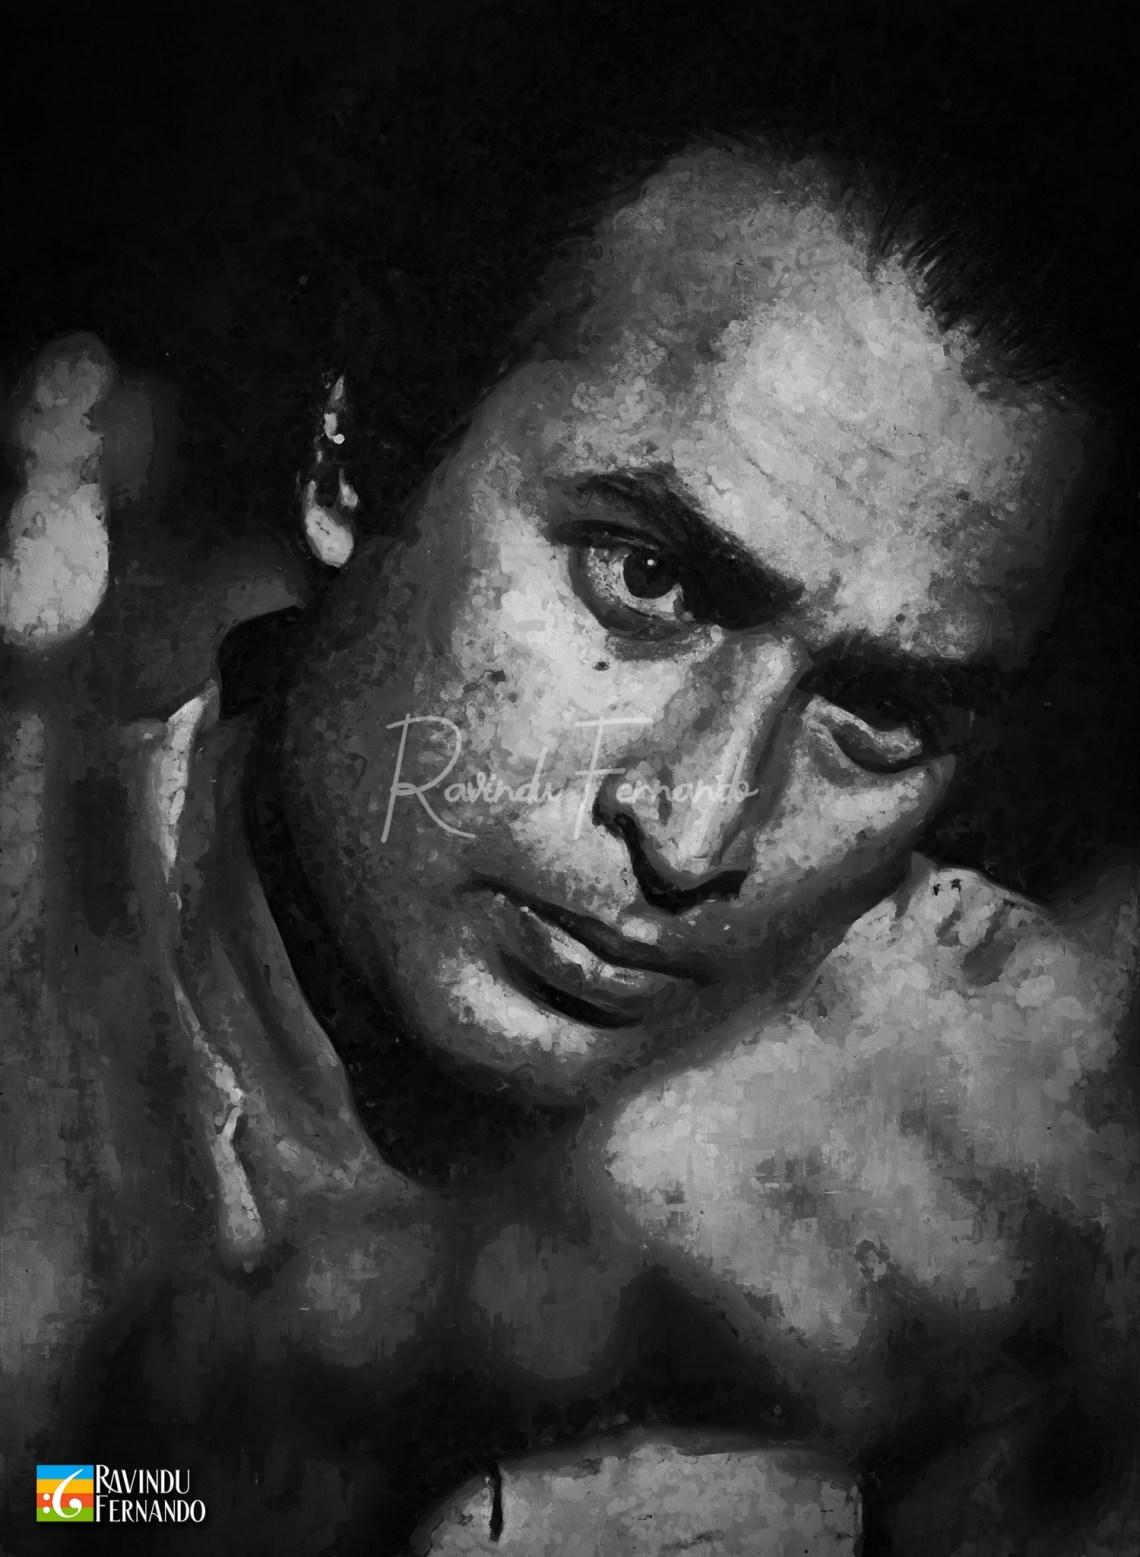 Gamini Fonseka Digital Oil Painting by Ravindu Fernando